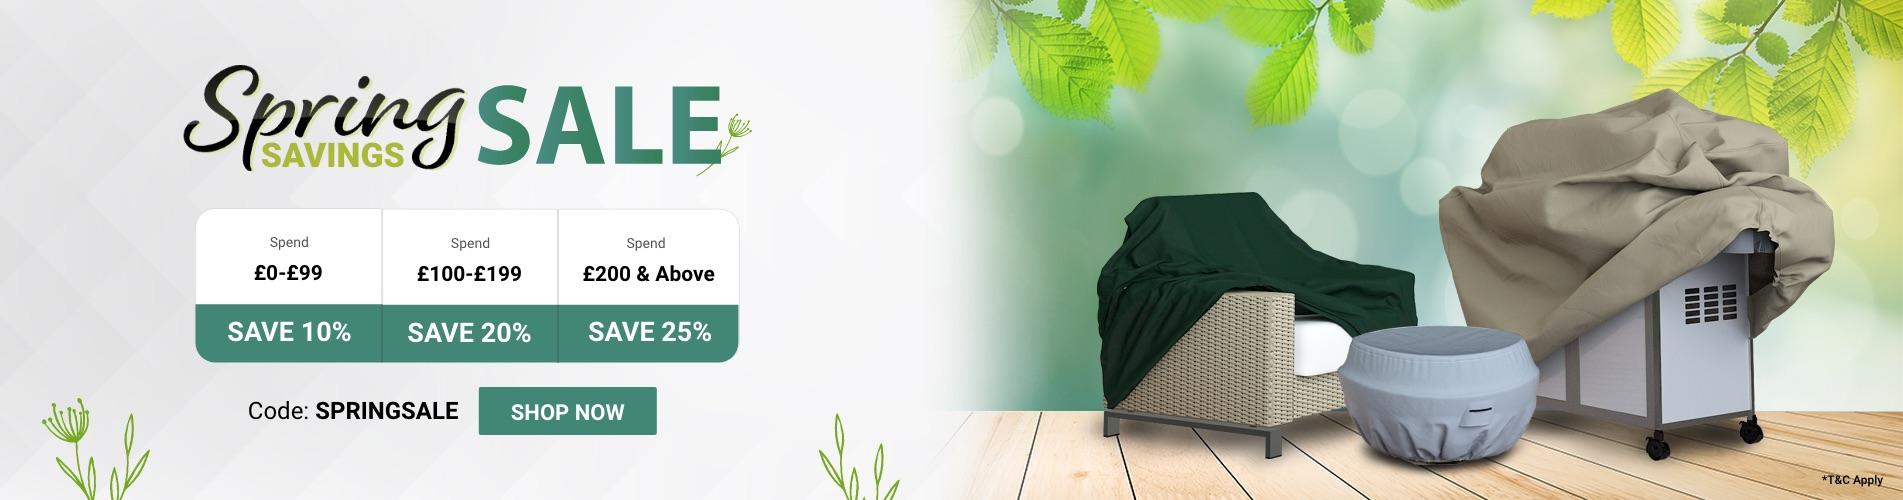 Spring/Autumn Savings Sale